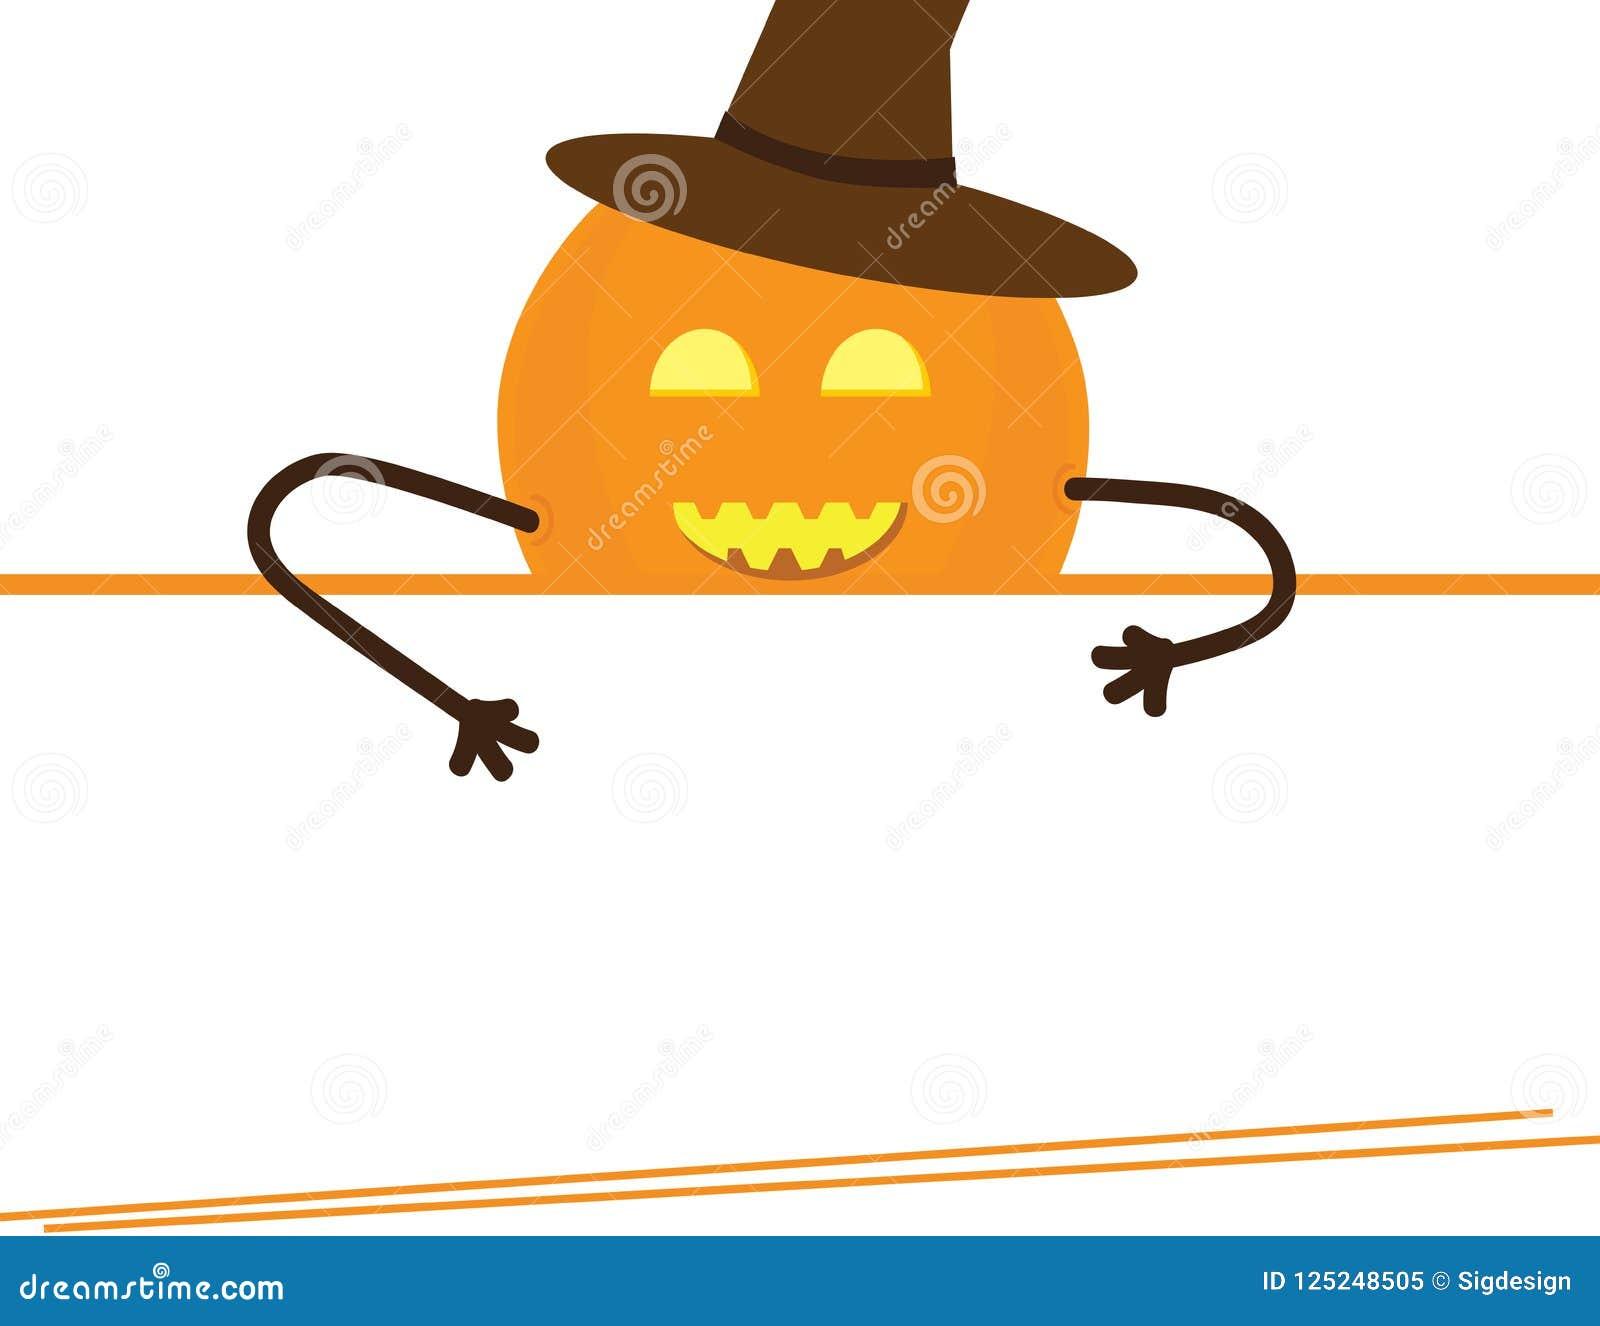 Halloween Template Pumpkin Witch Hat Stock Vector Illustration Of Autumn Halloween 125248505